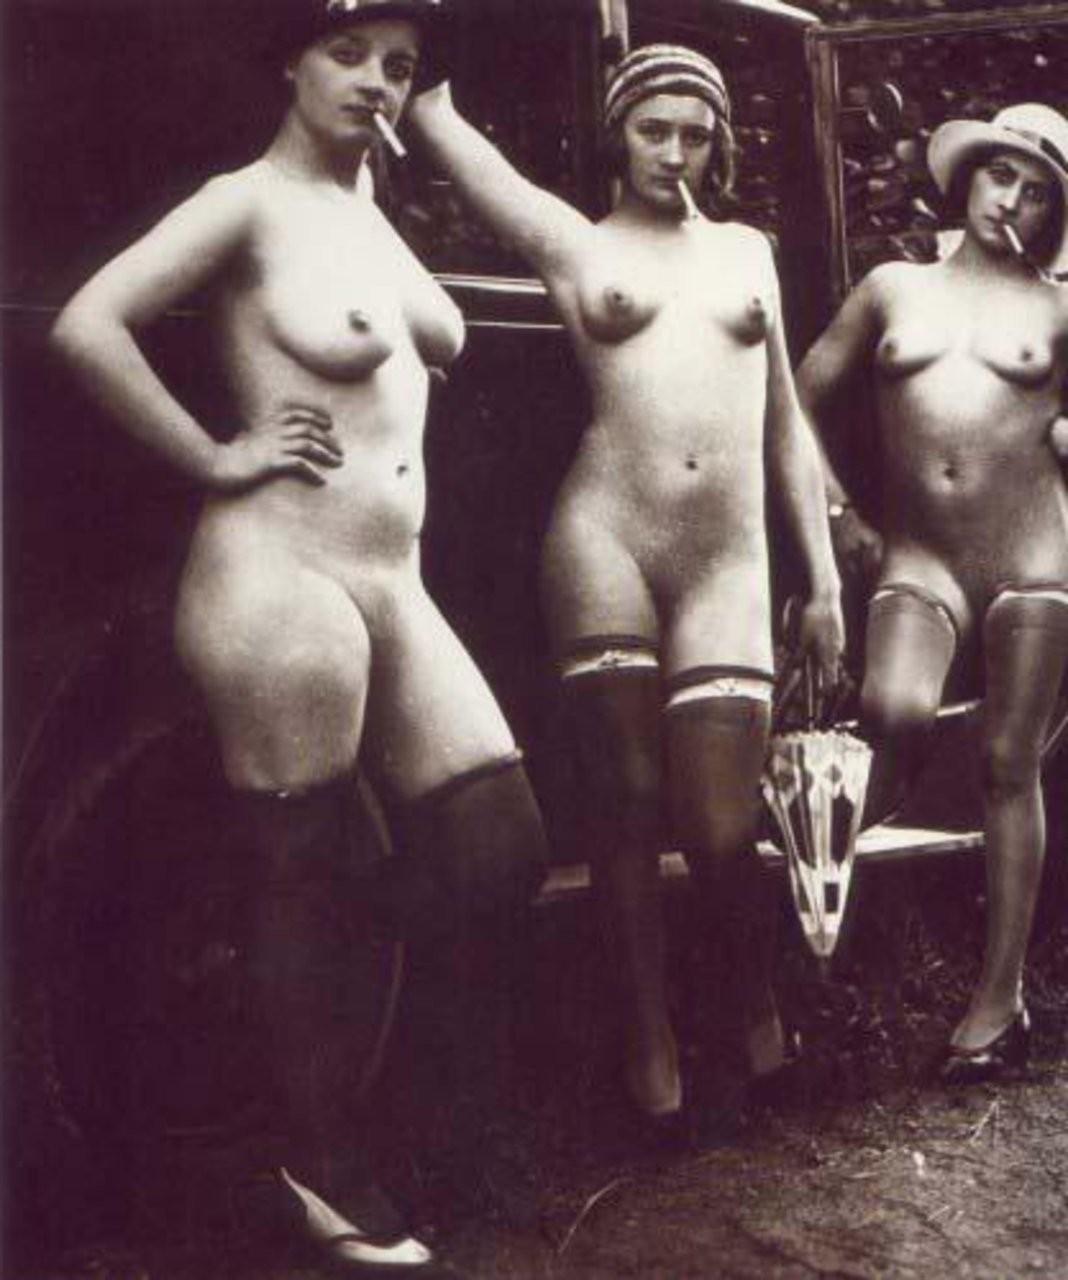 sunny leone hot nude images – Amateur